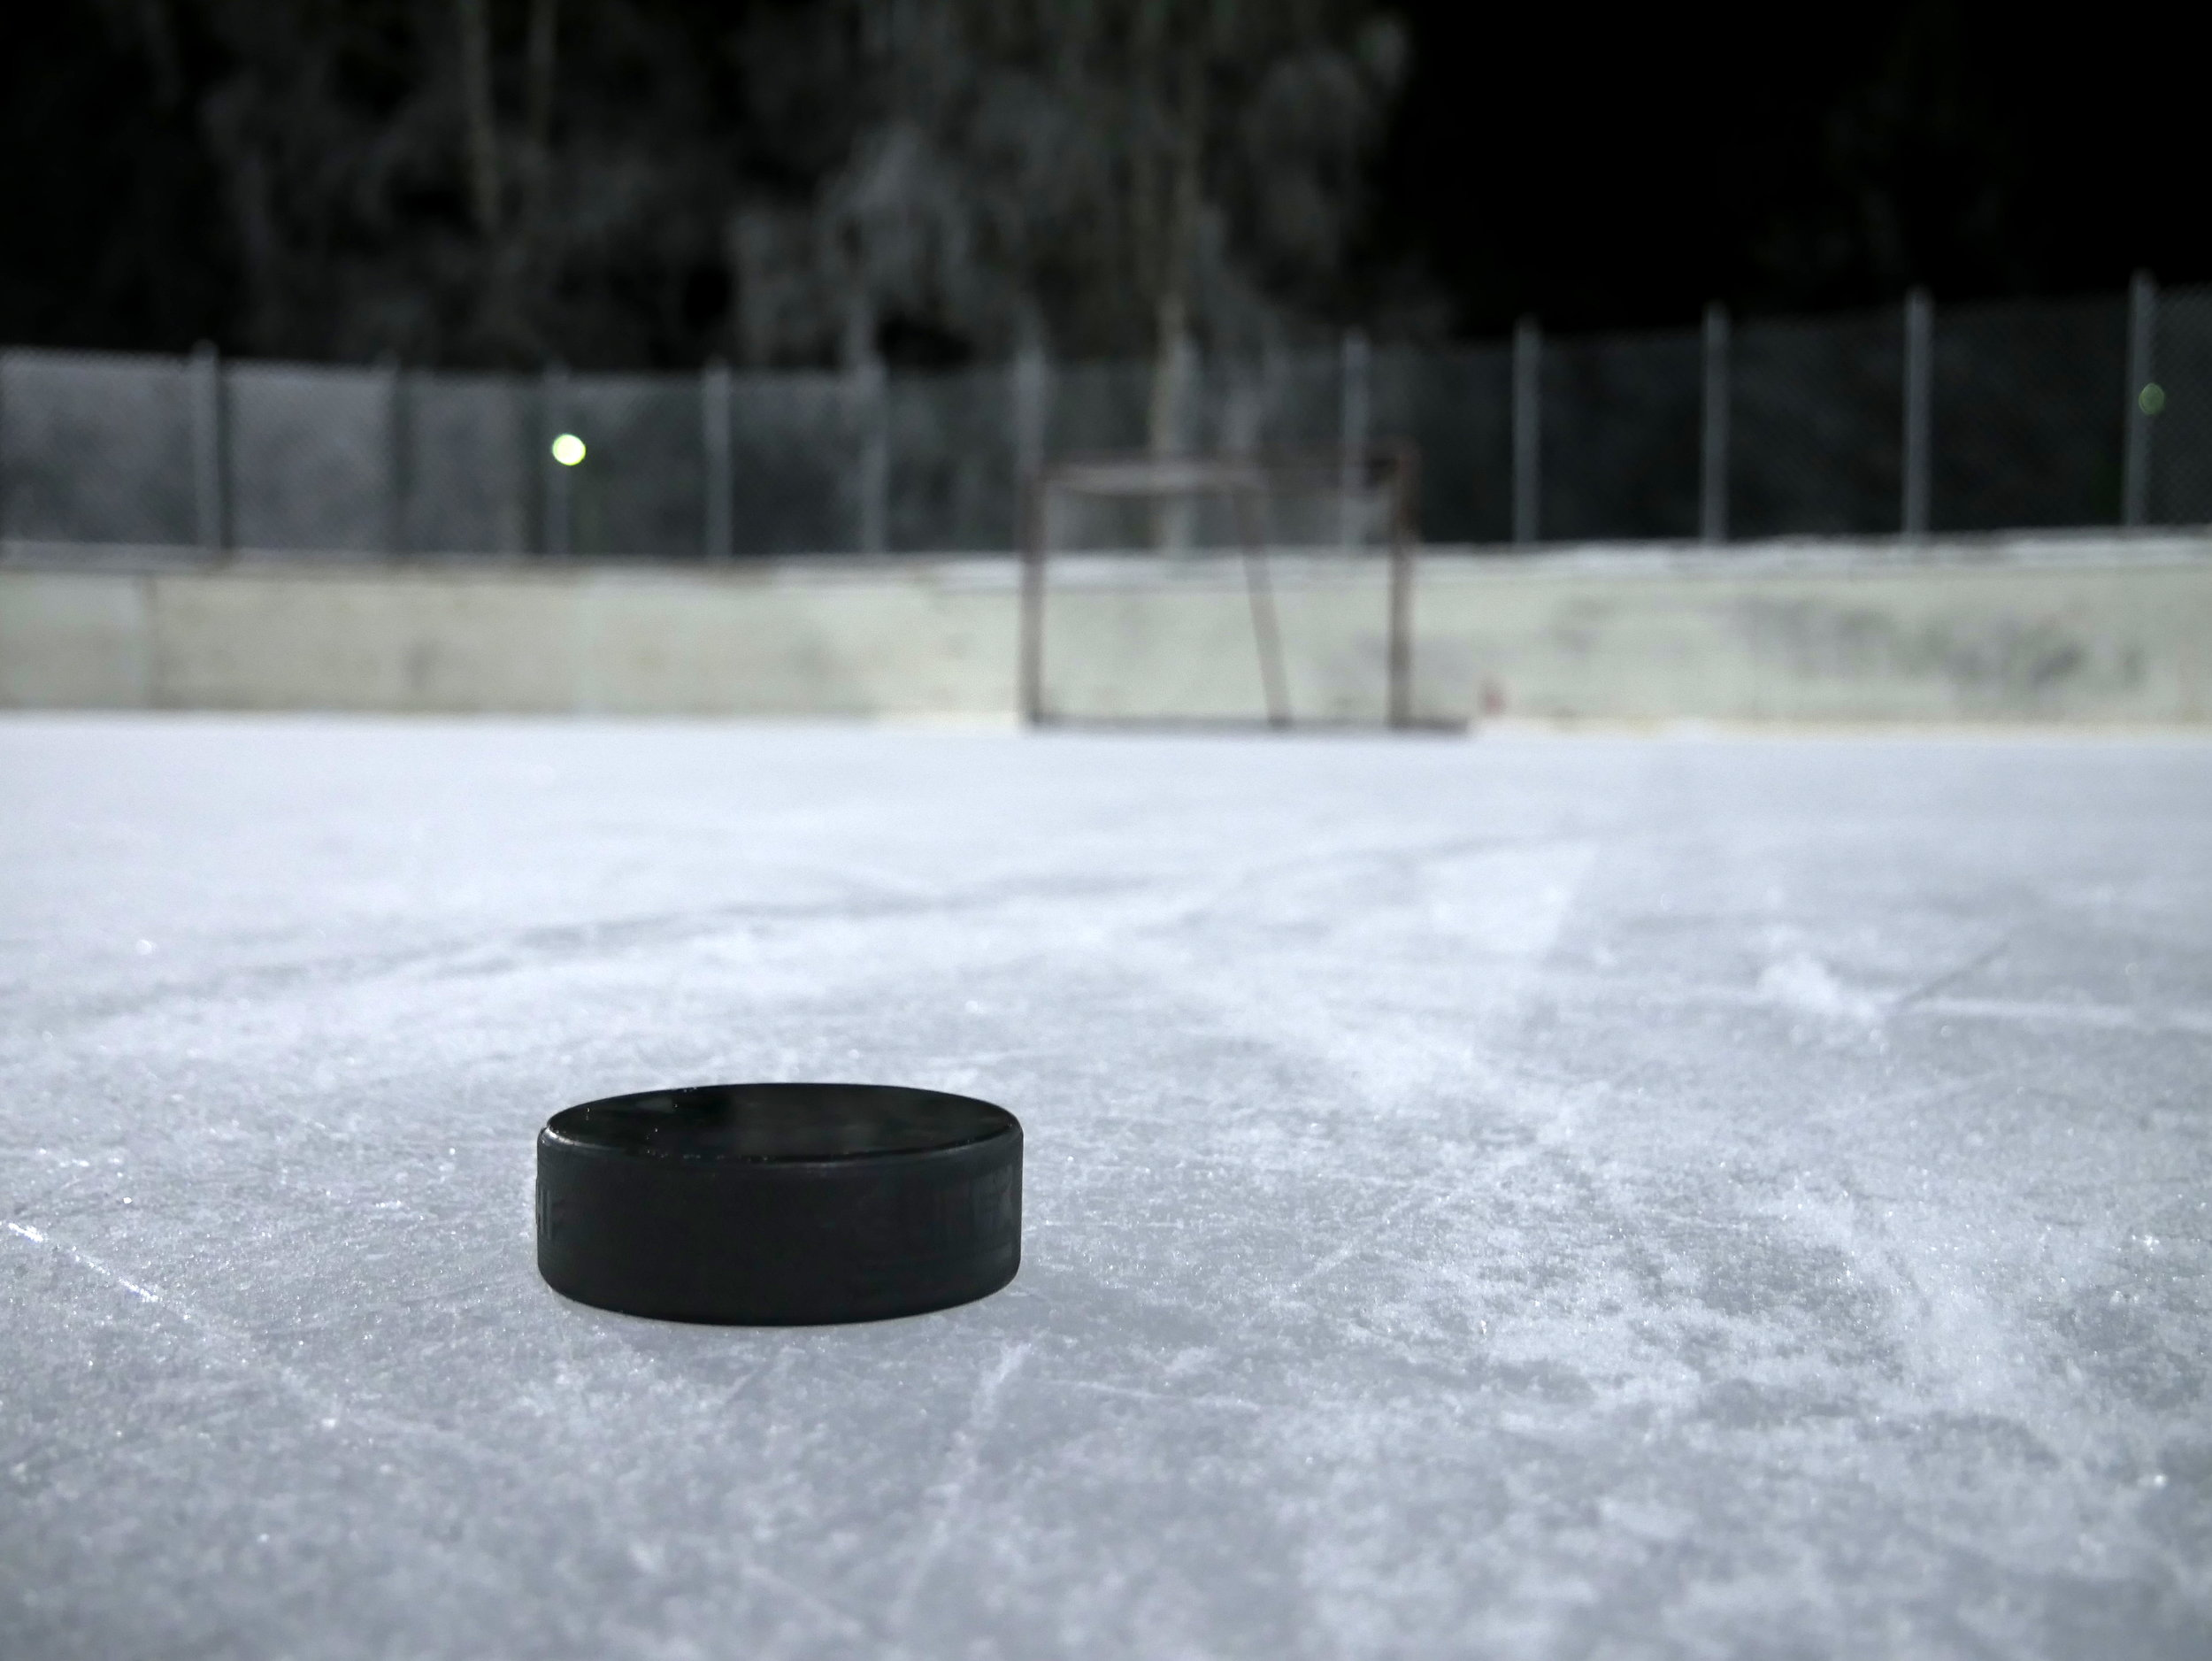 Ice_hockey_puck_on_ice_20180112.jpg